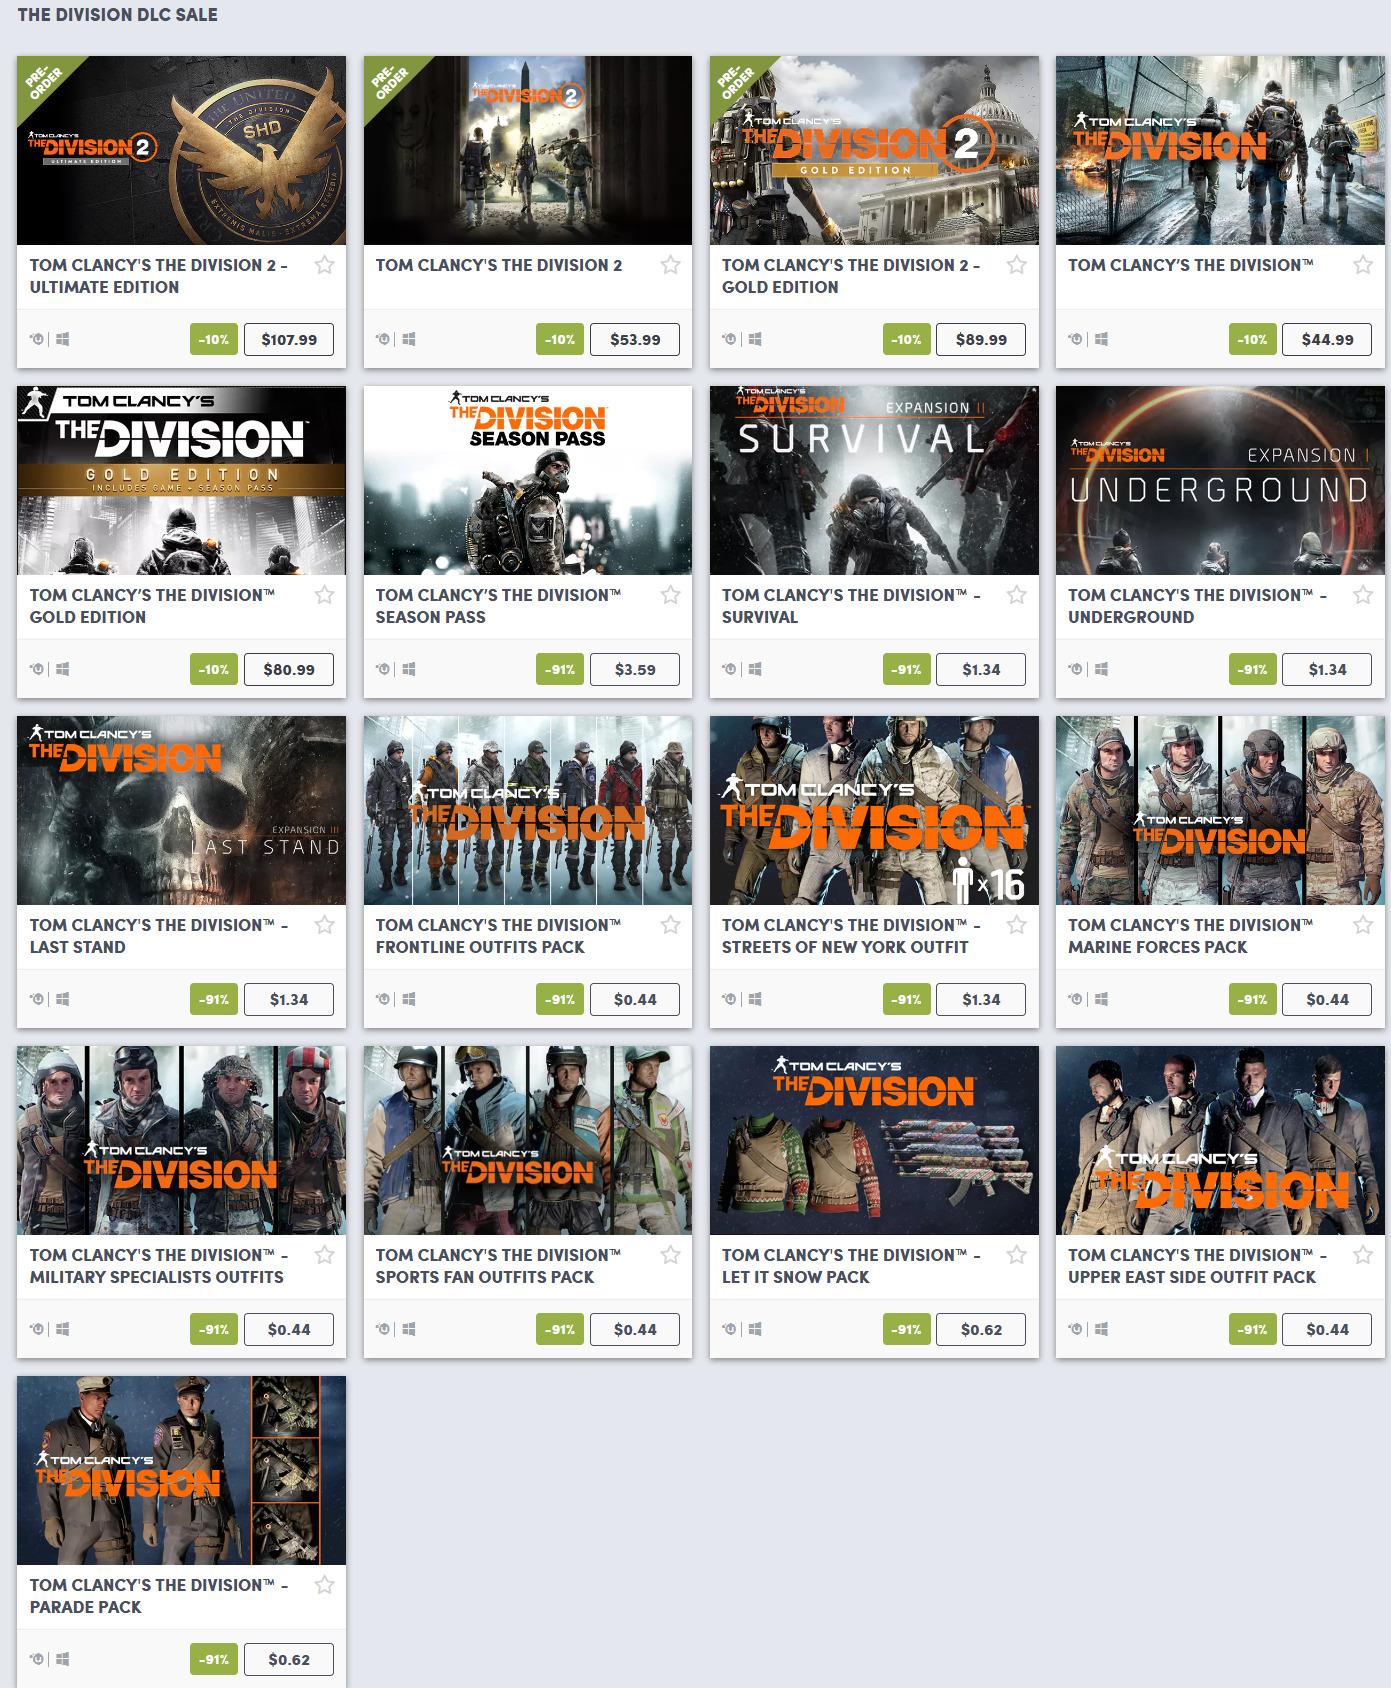 Screenshot_2019-02-02 The Division DLC Sale Humble Store.jpg